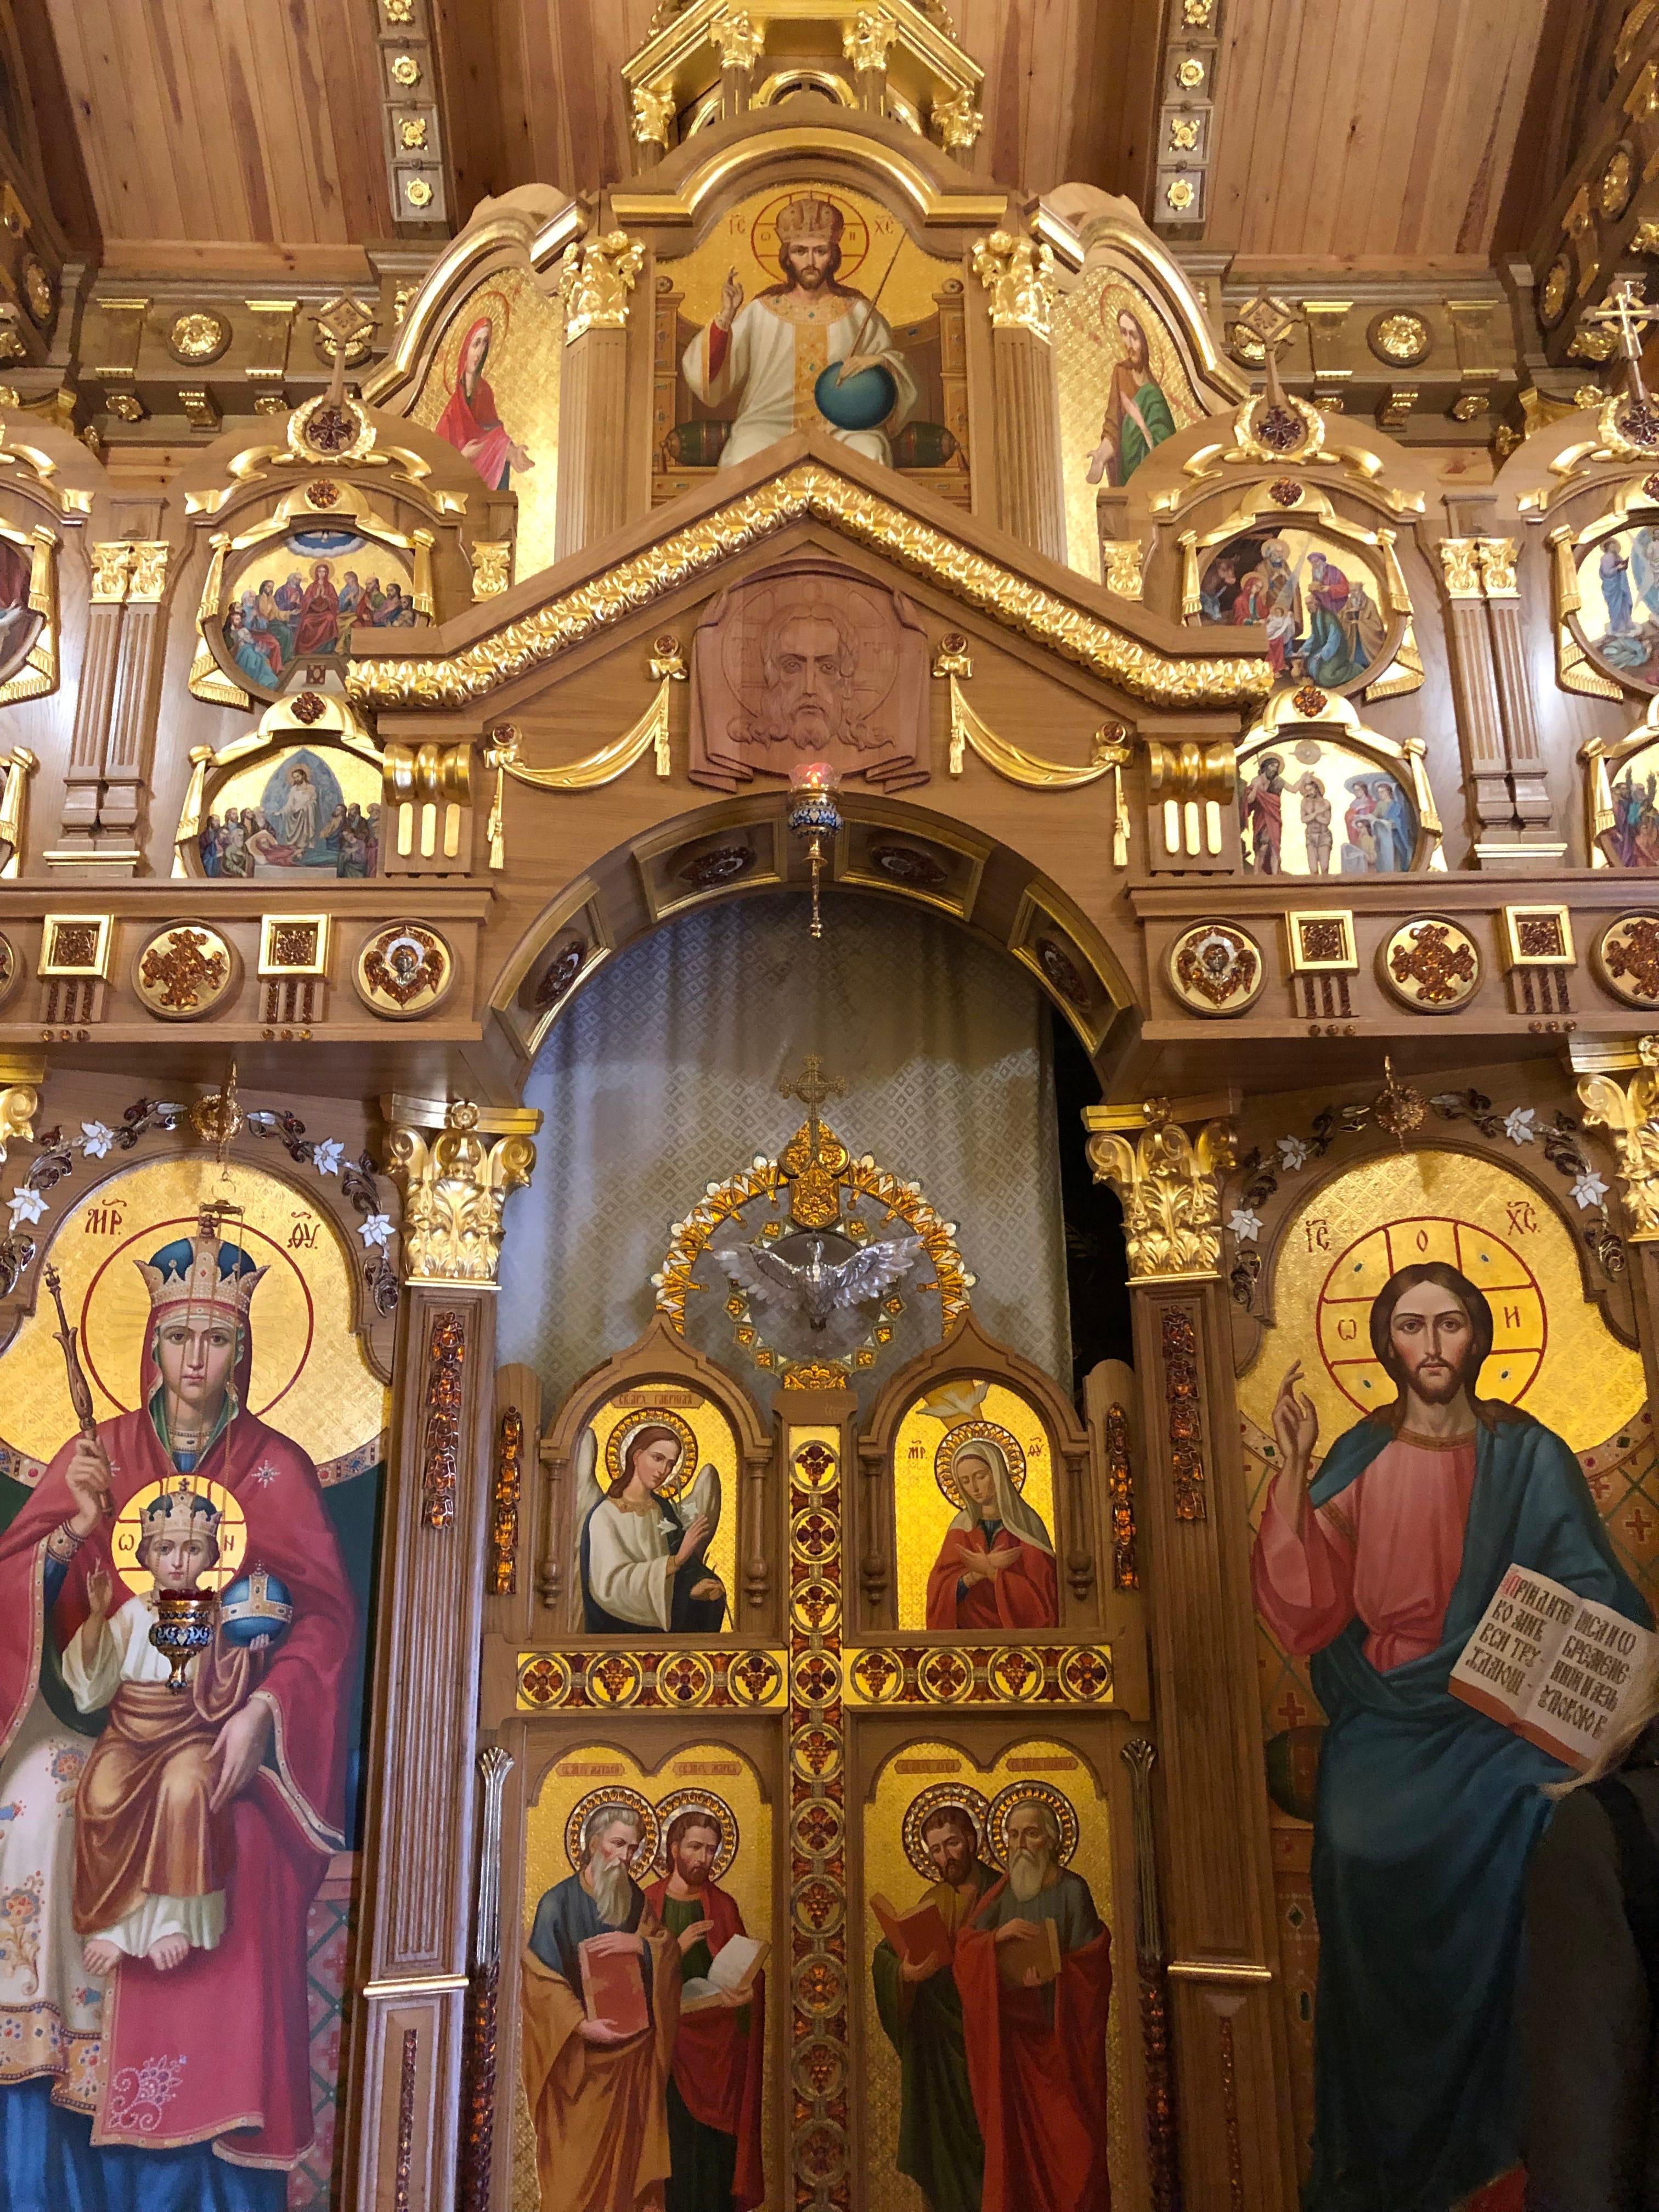 A view inside the church former Ukraine President Viktor Yanukovych built at his former residence outside Kyiv, on Oct. 4, 2019.